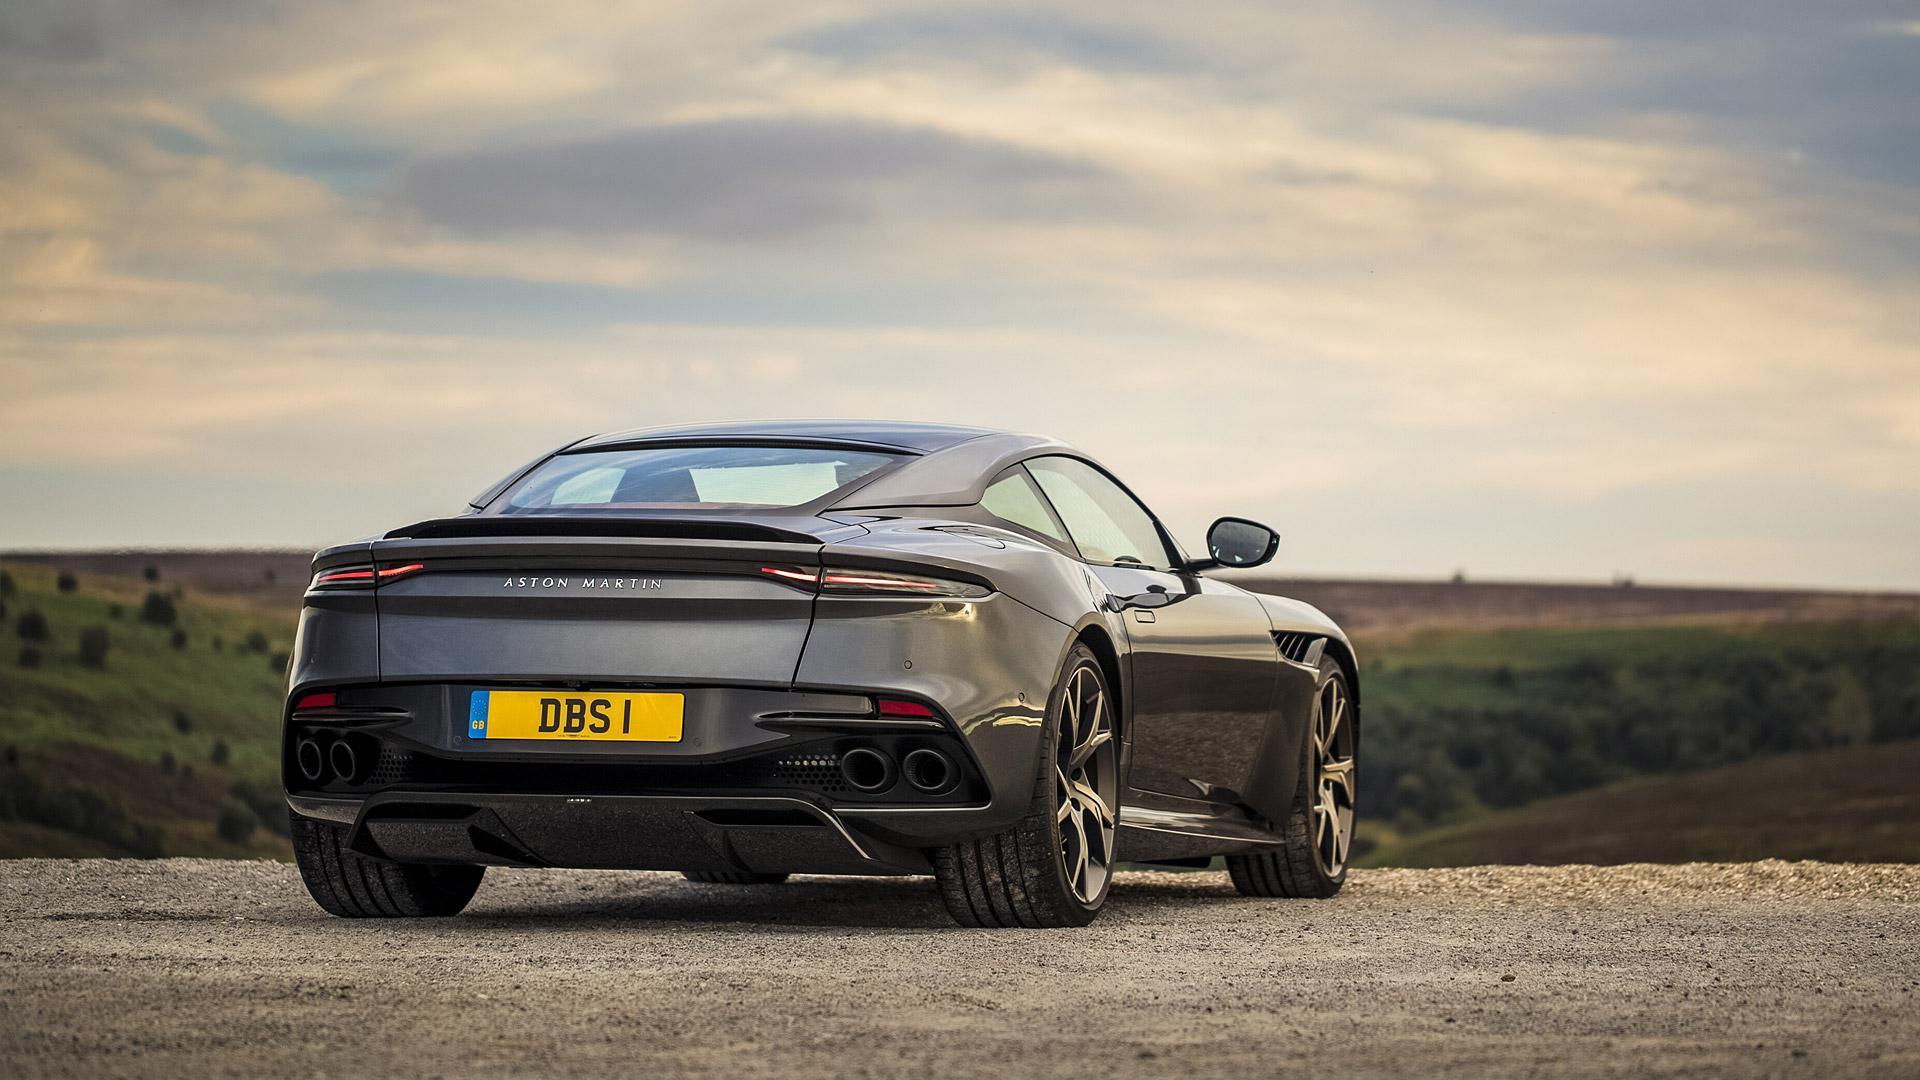 Aston Martin Dbs Superleggera Volante Wallpapers Wallpaper Cave